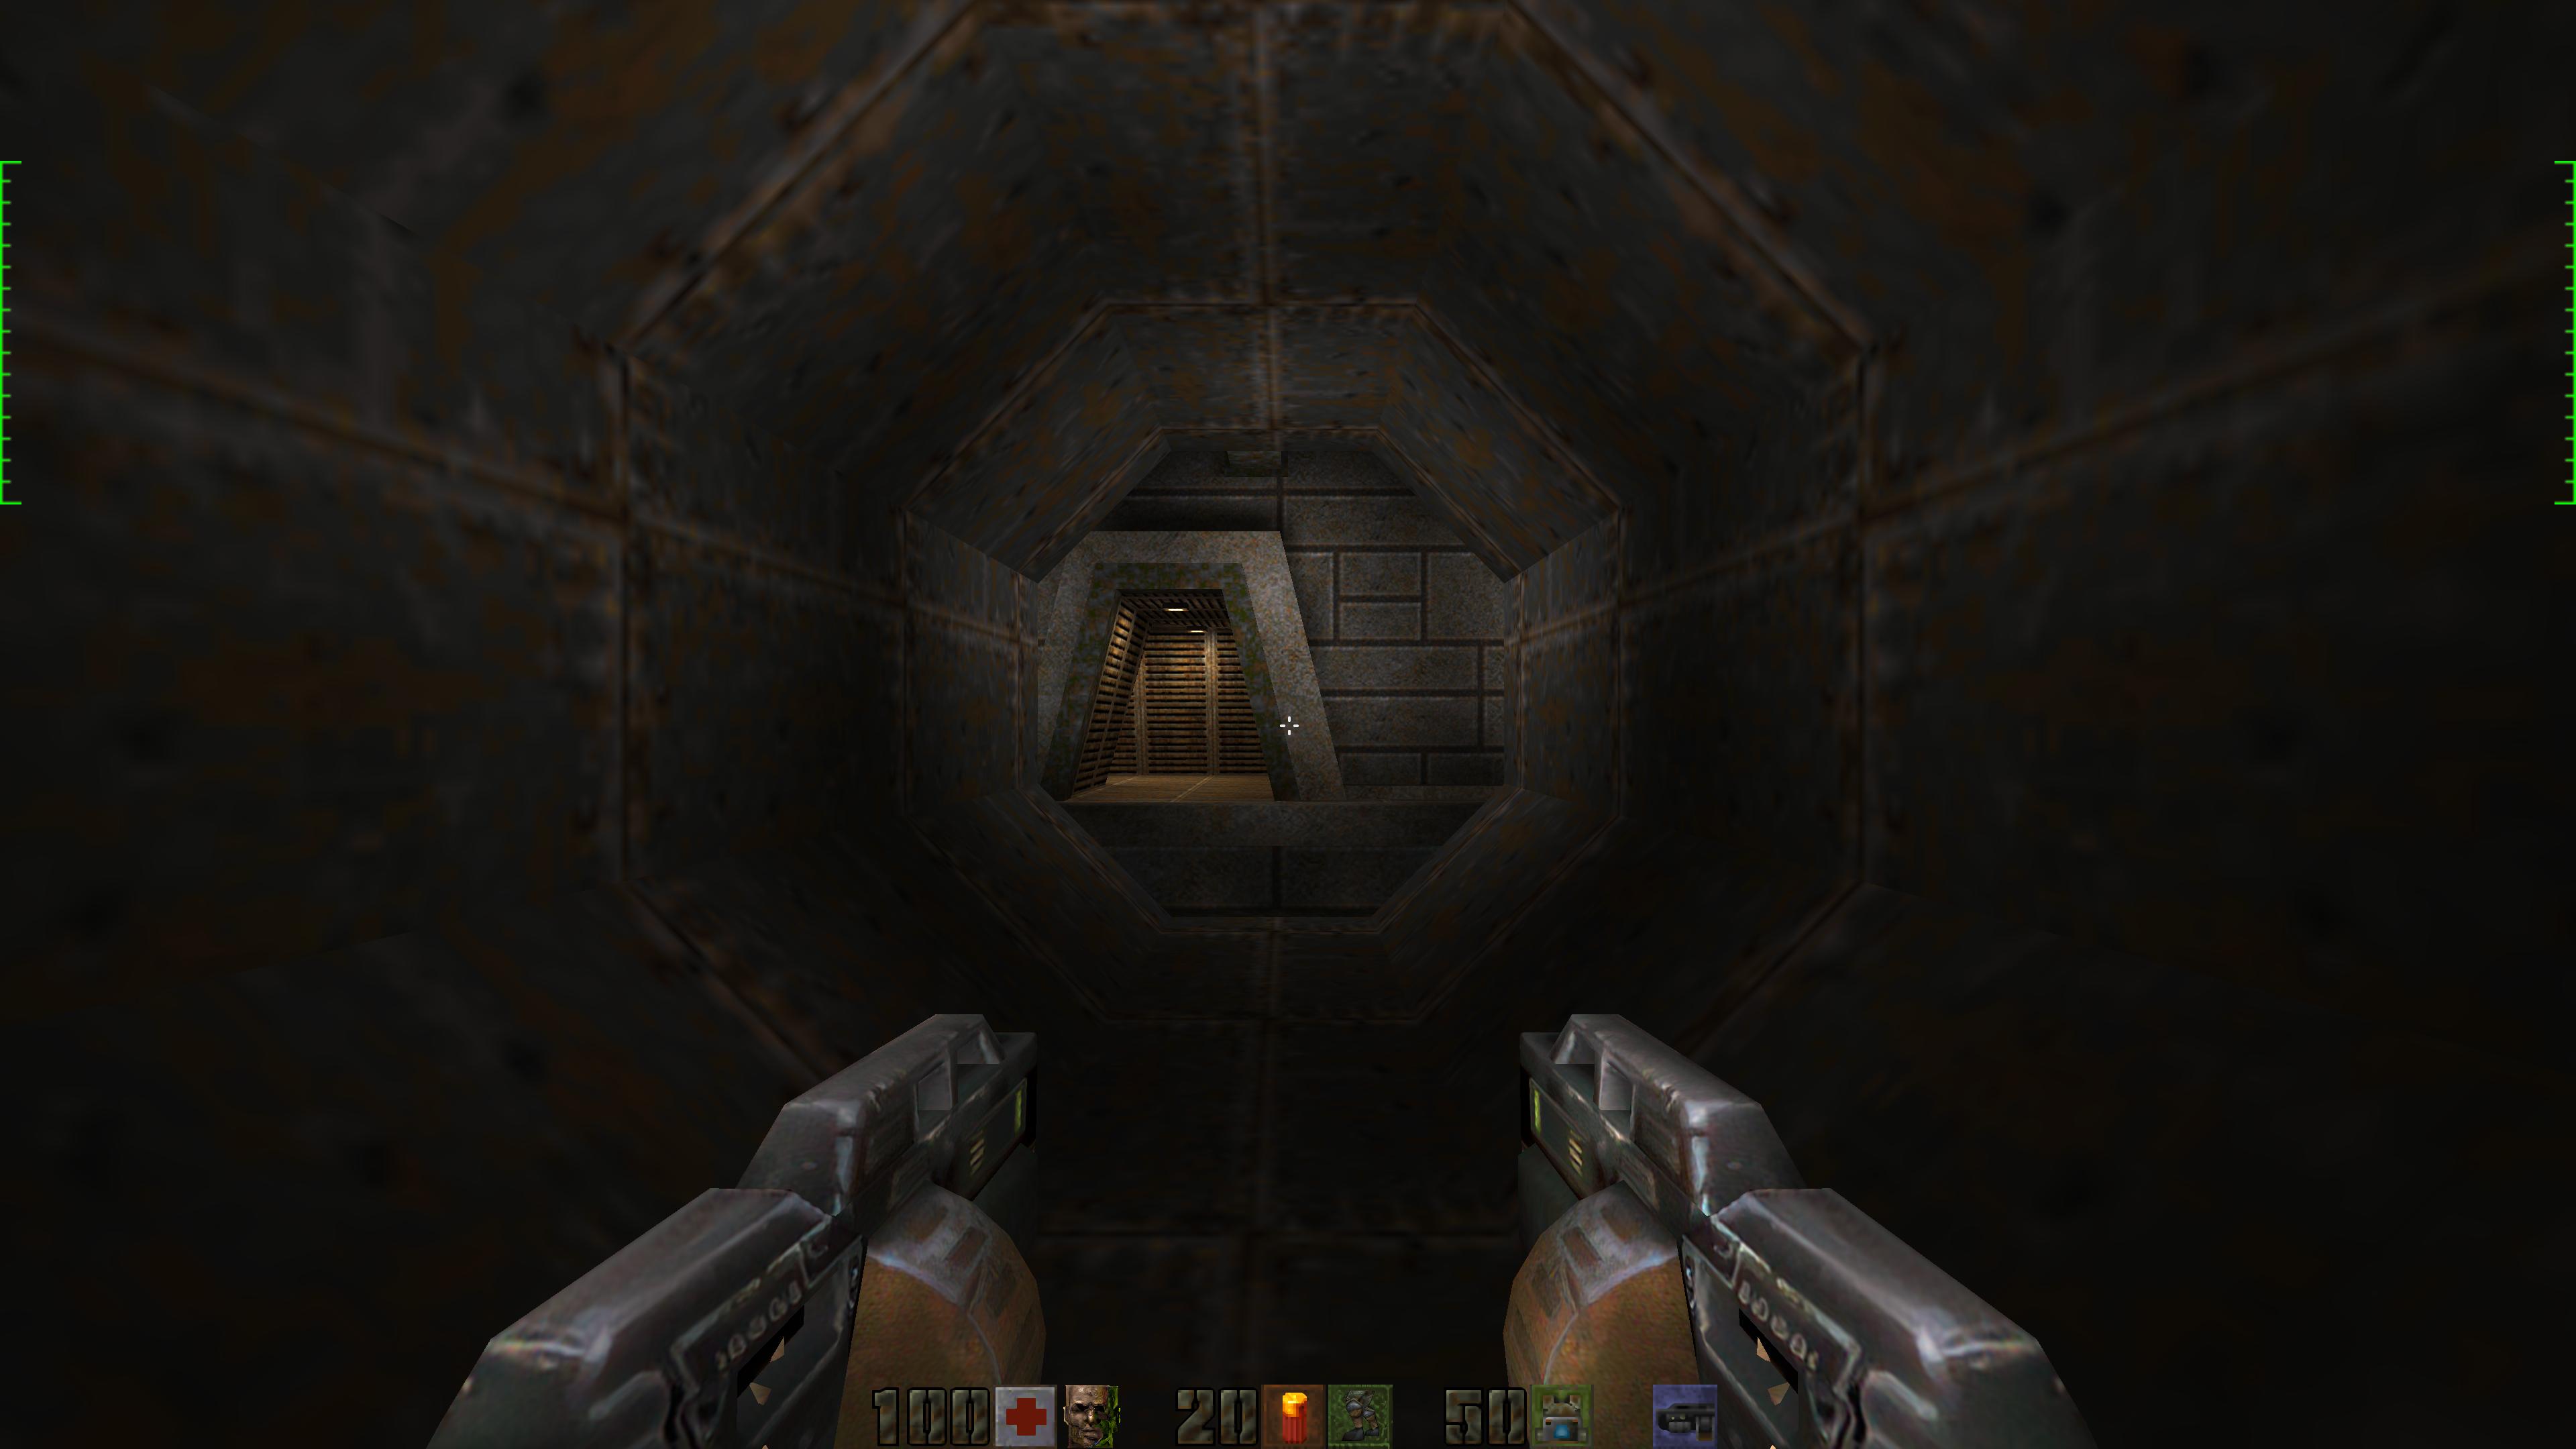 Brutal Quake 2